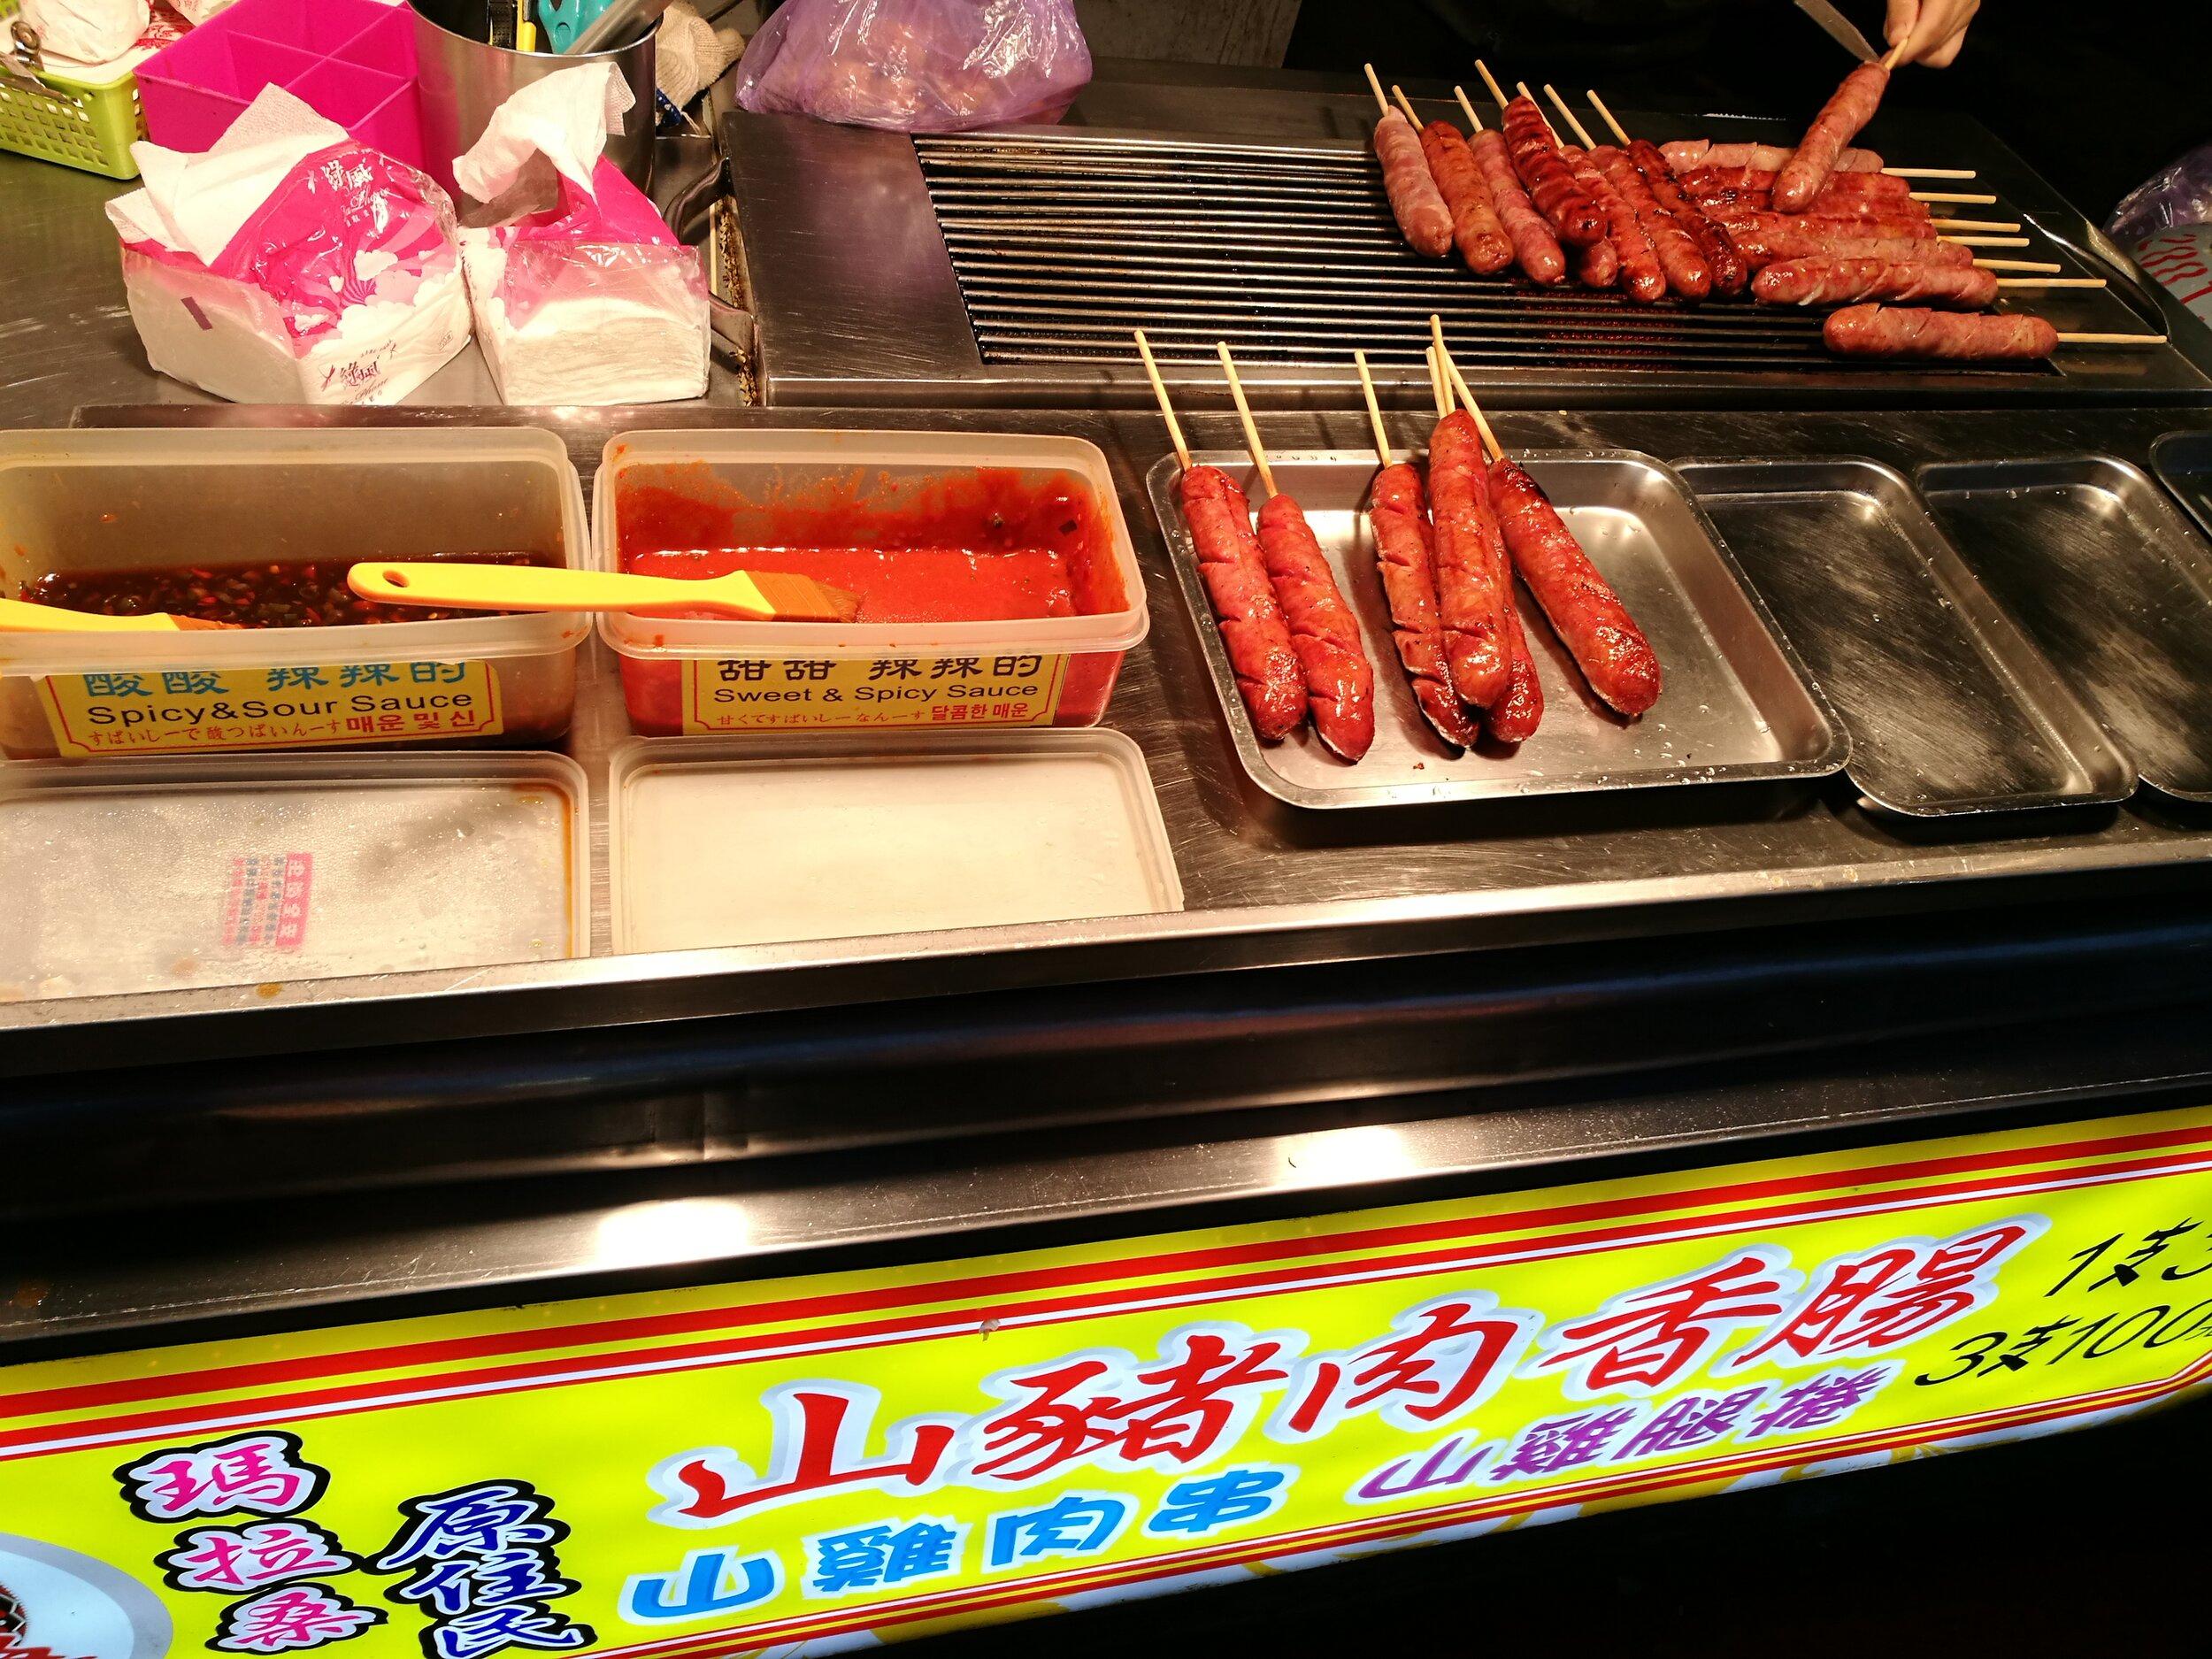 A simple sausage